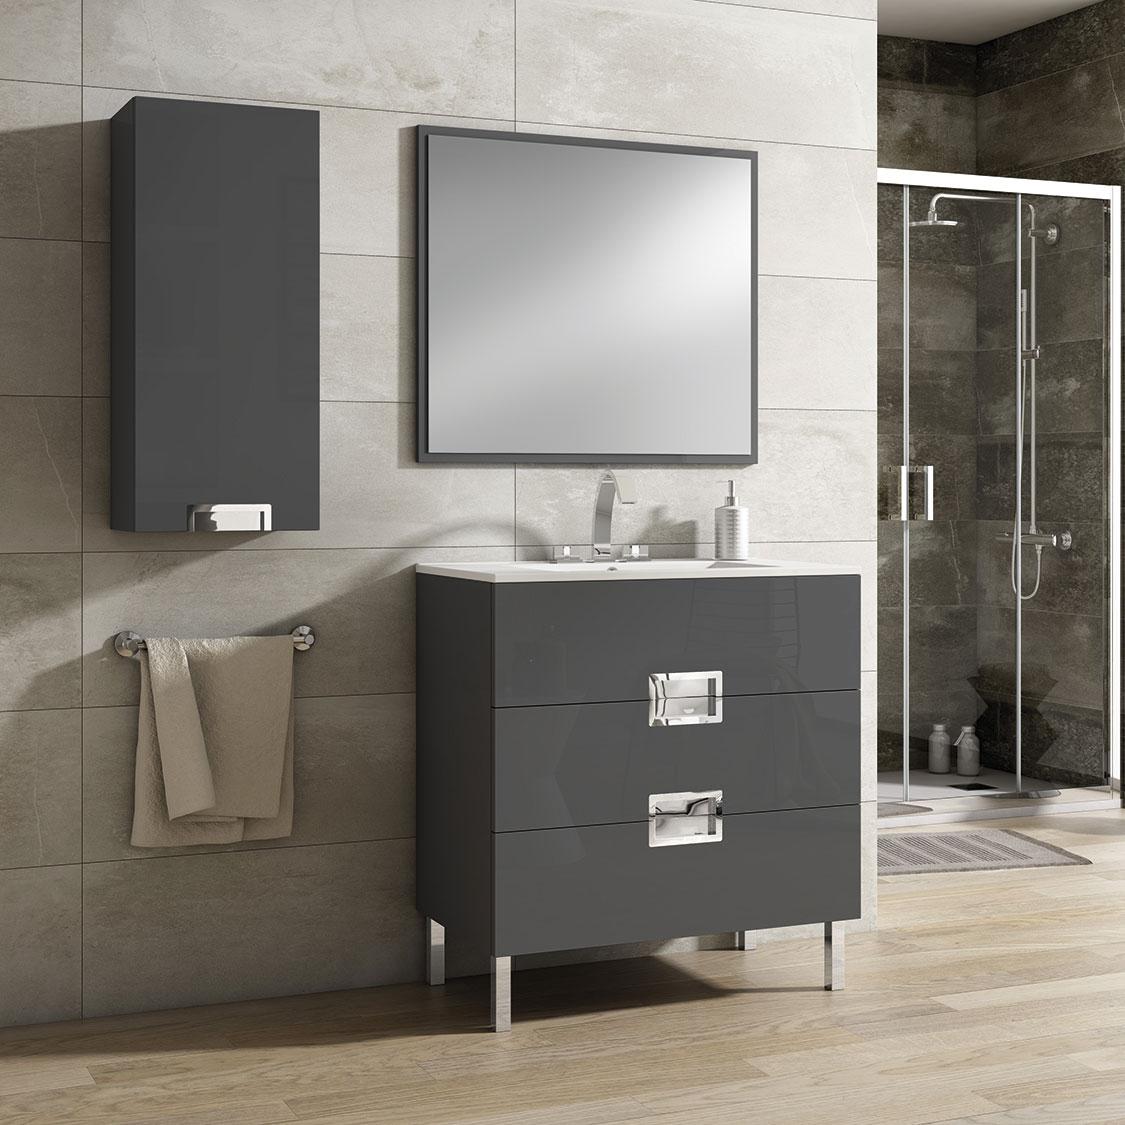 Mueble de baño ÓPERA grafito brillo